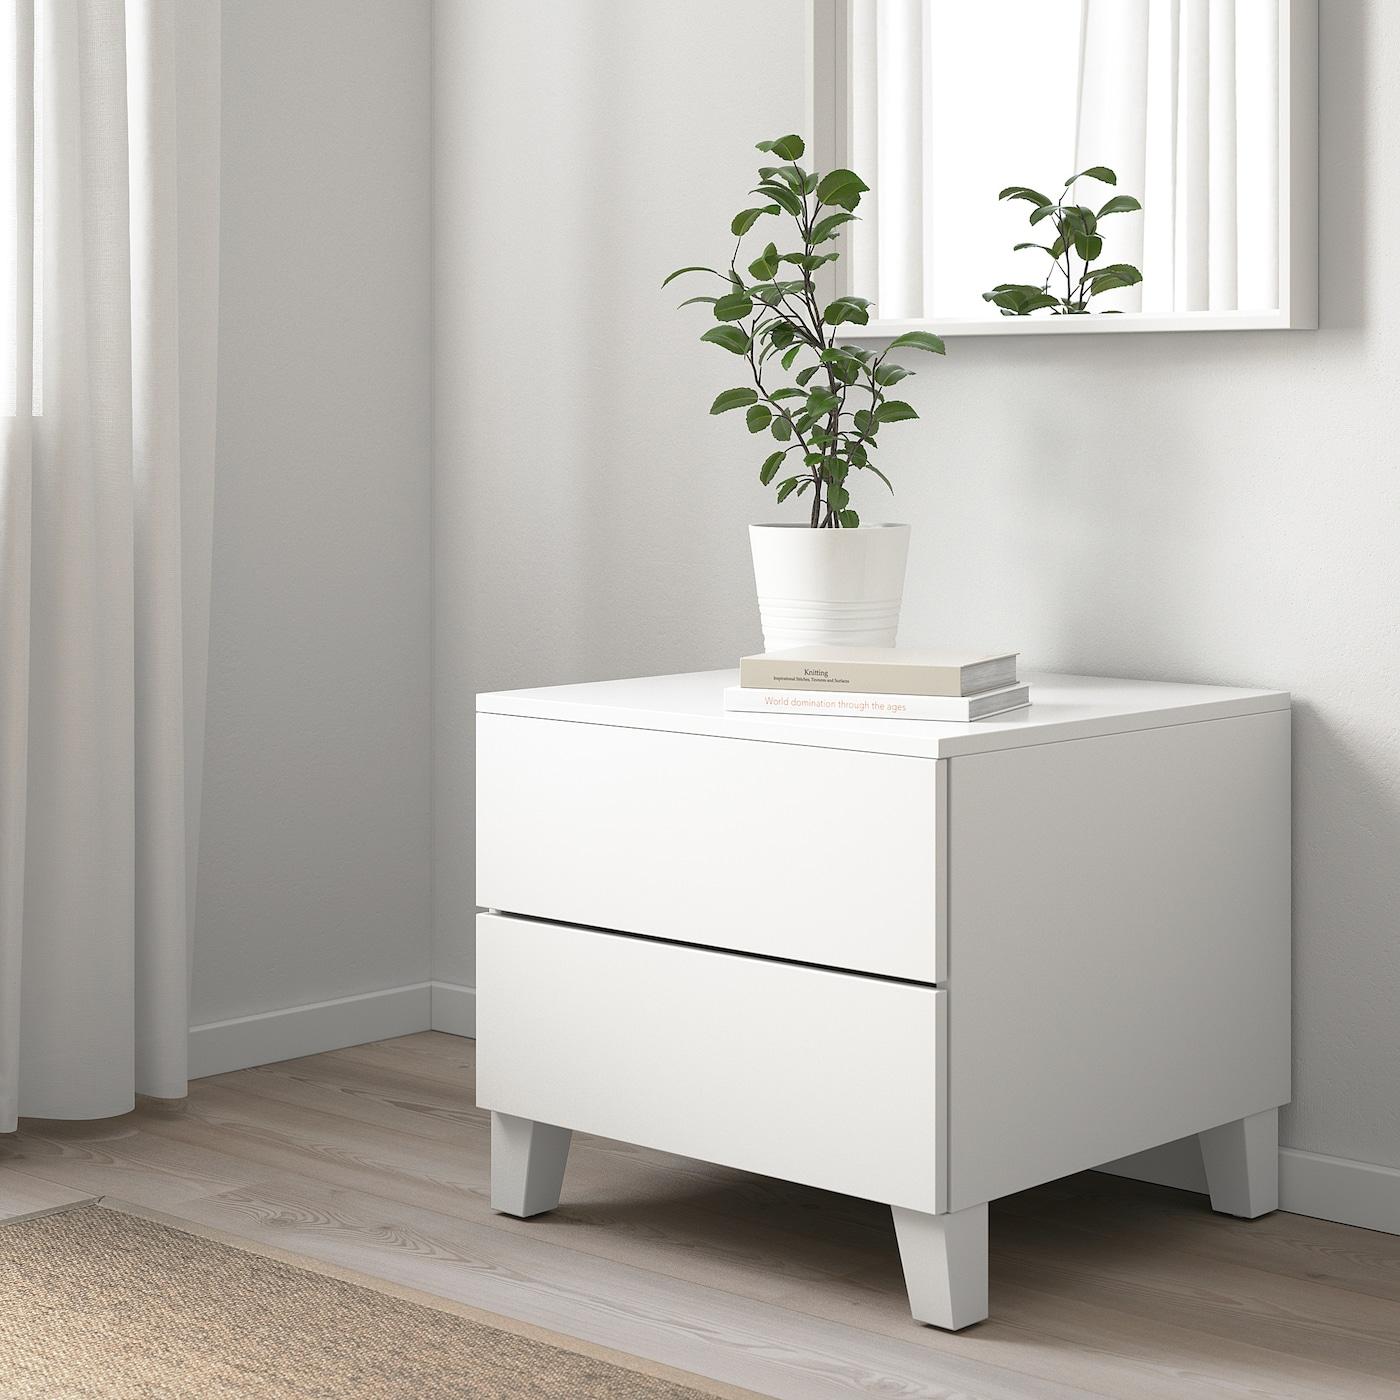 PLATSA Komoda s 2 zásuvkami, biela/Fonnes biela, 60x57x53 cm